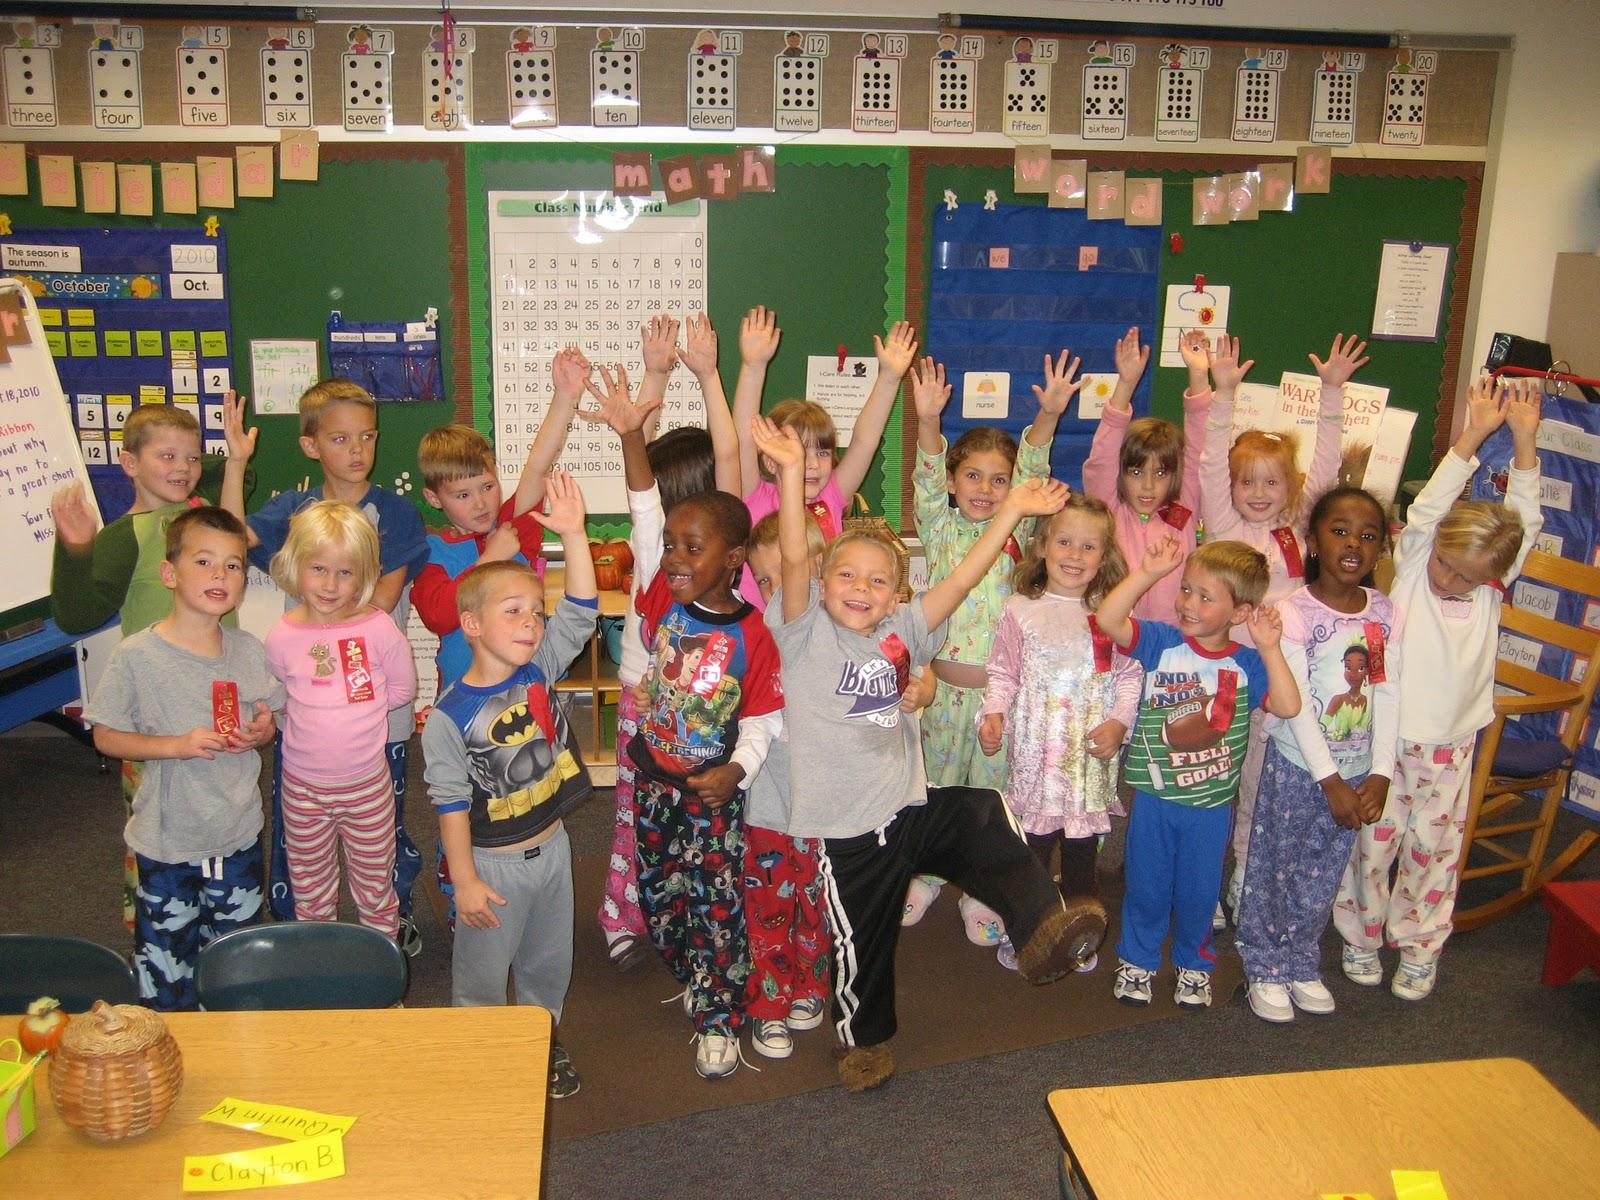 Mrs Petty S Kindergarten Classroom Pajama Day